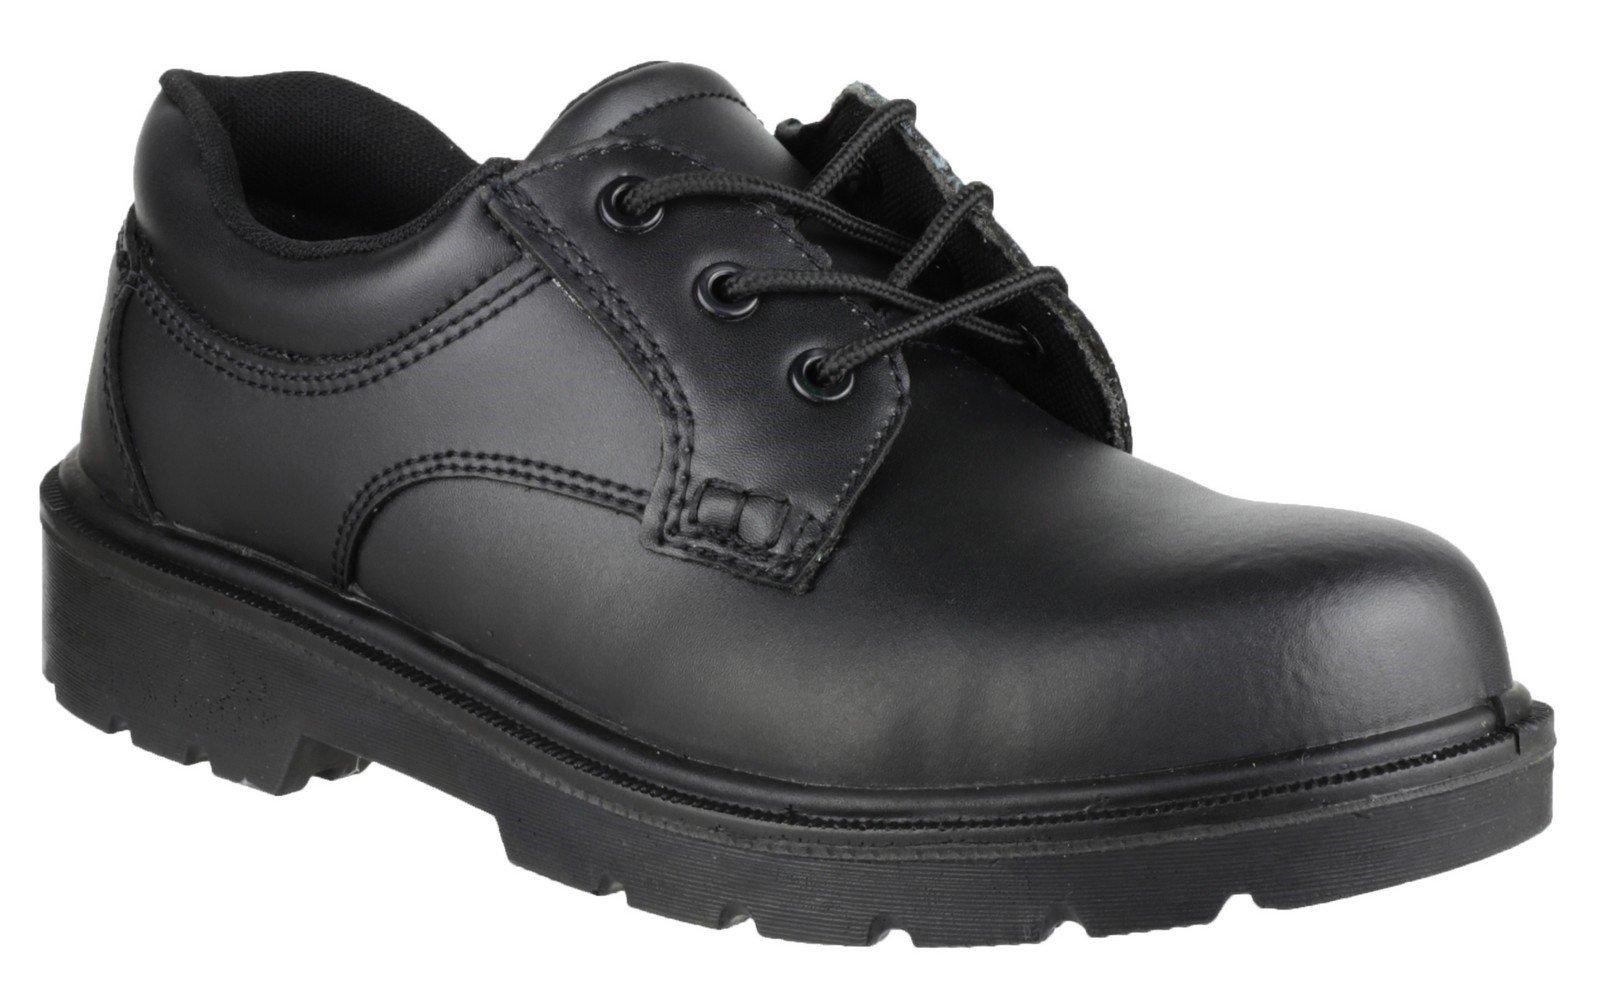 Amblers Unisex Safety Gibson Lace Shoe Black 01616 - Black 4